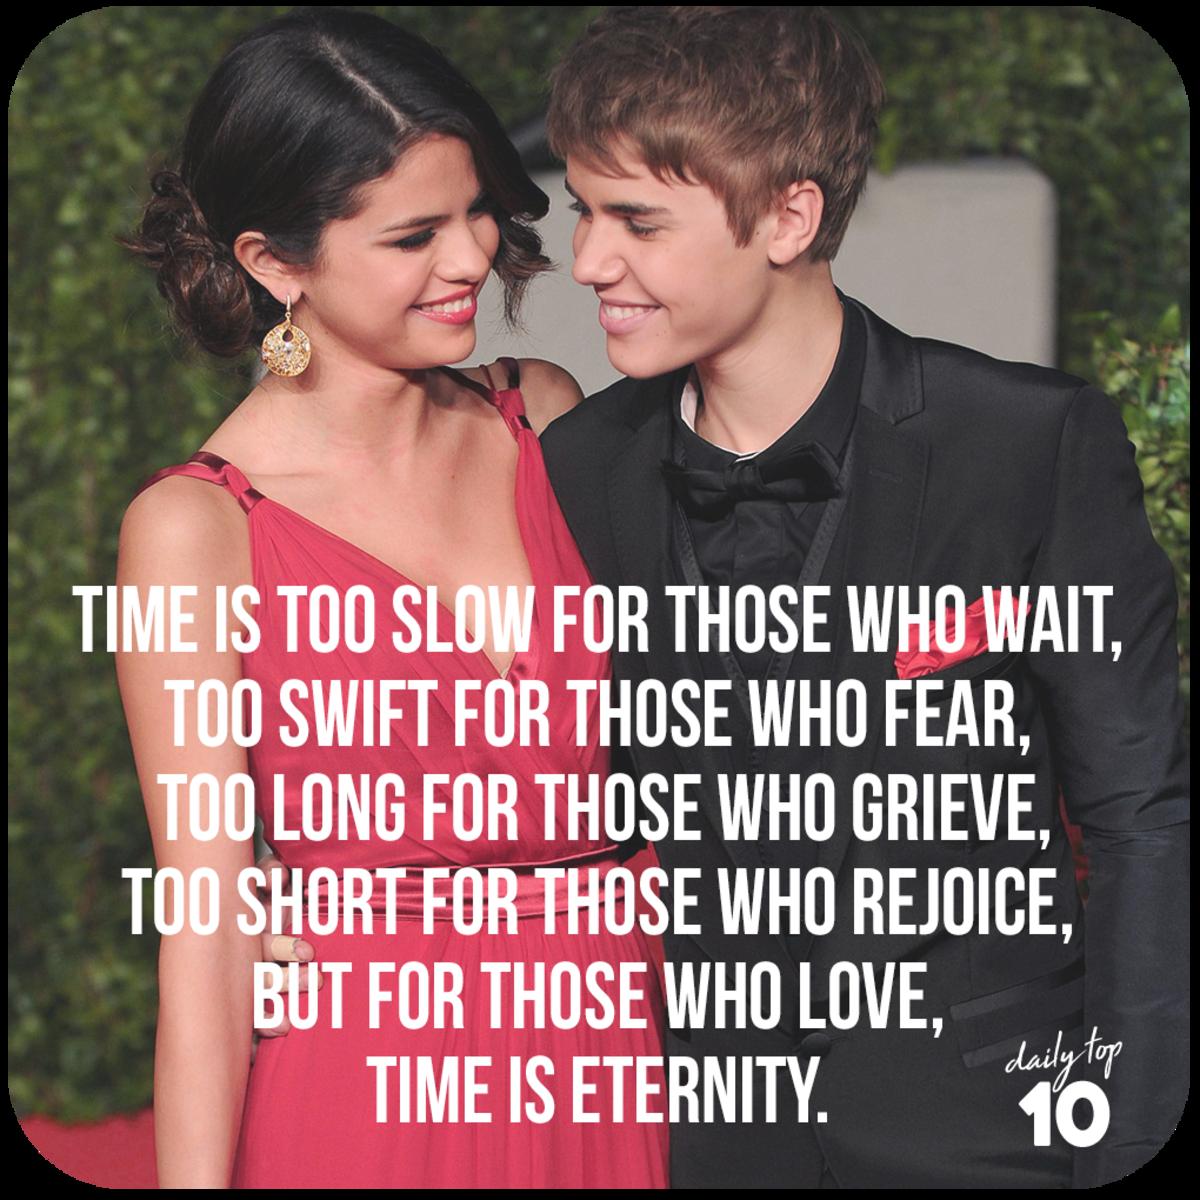 Justin Bieber and Selena Gomez oscars